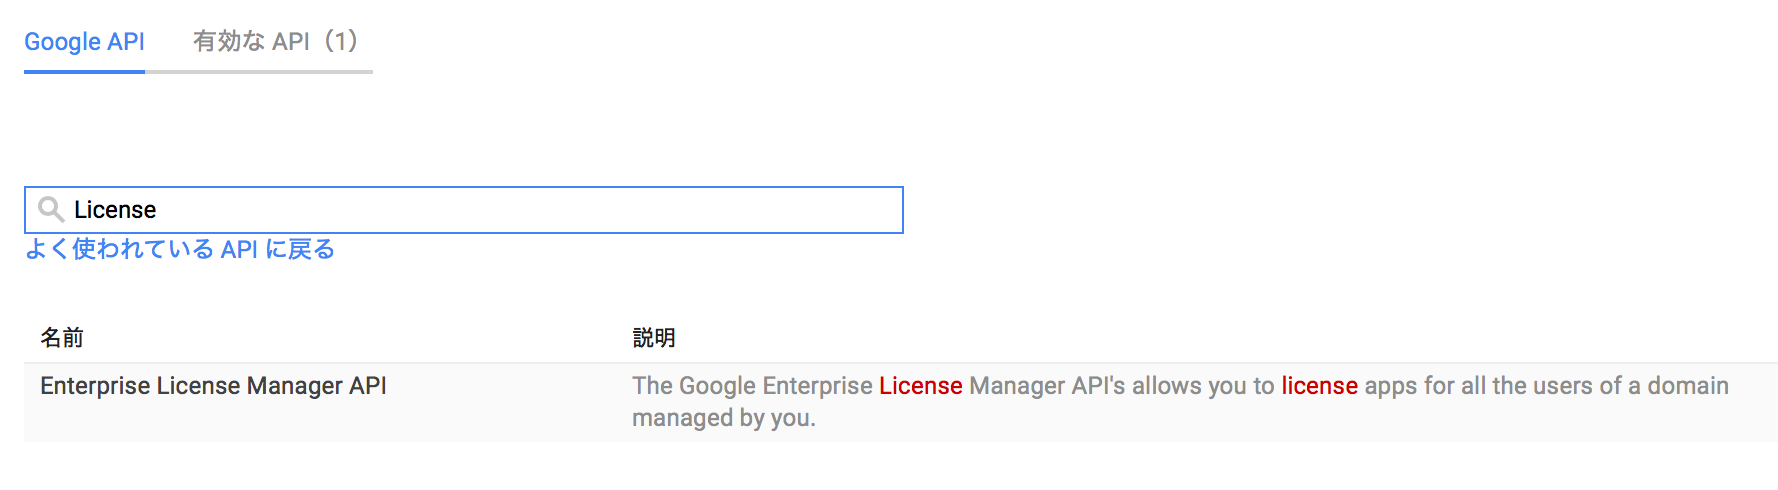 API_ライブラリ_-_LicenseManager.png